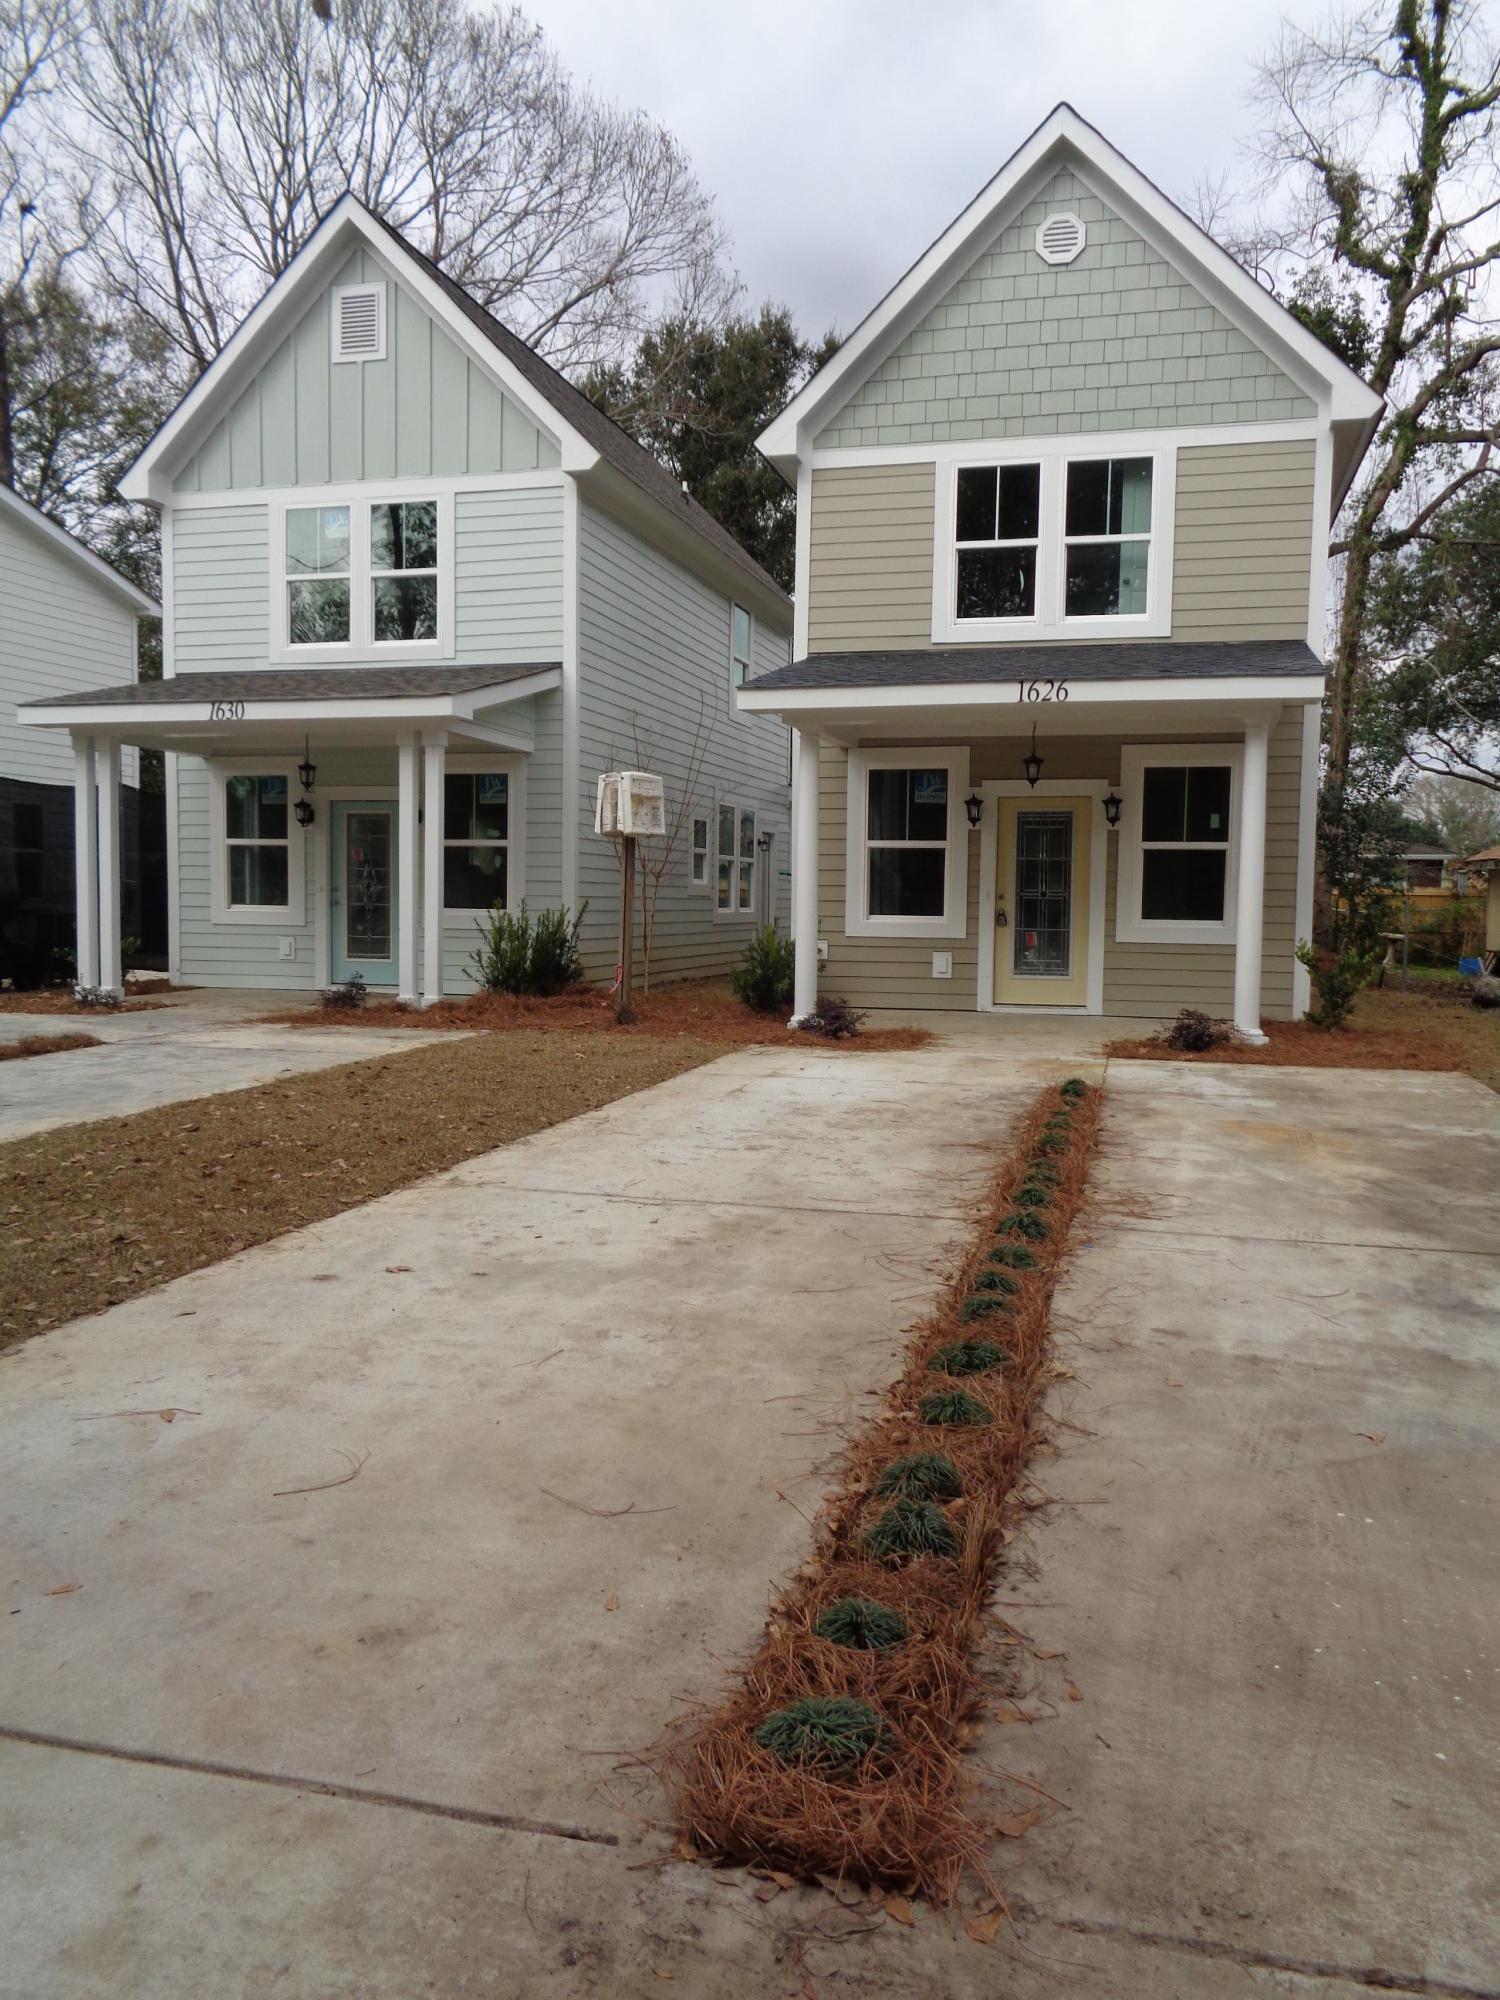 Pinecrest Gardens Homes For Sale - 1626 Wappoo, Charleston, SC - 37